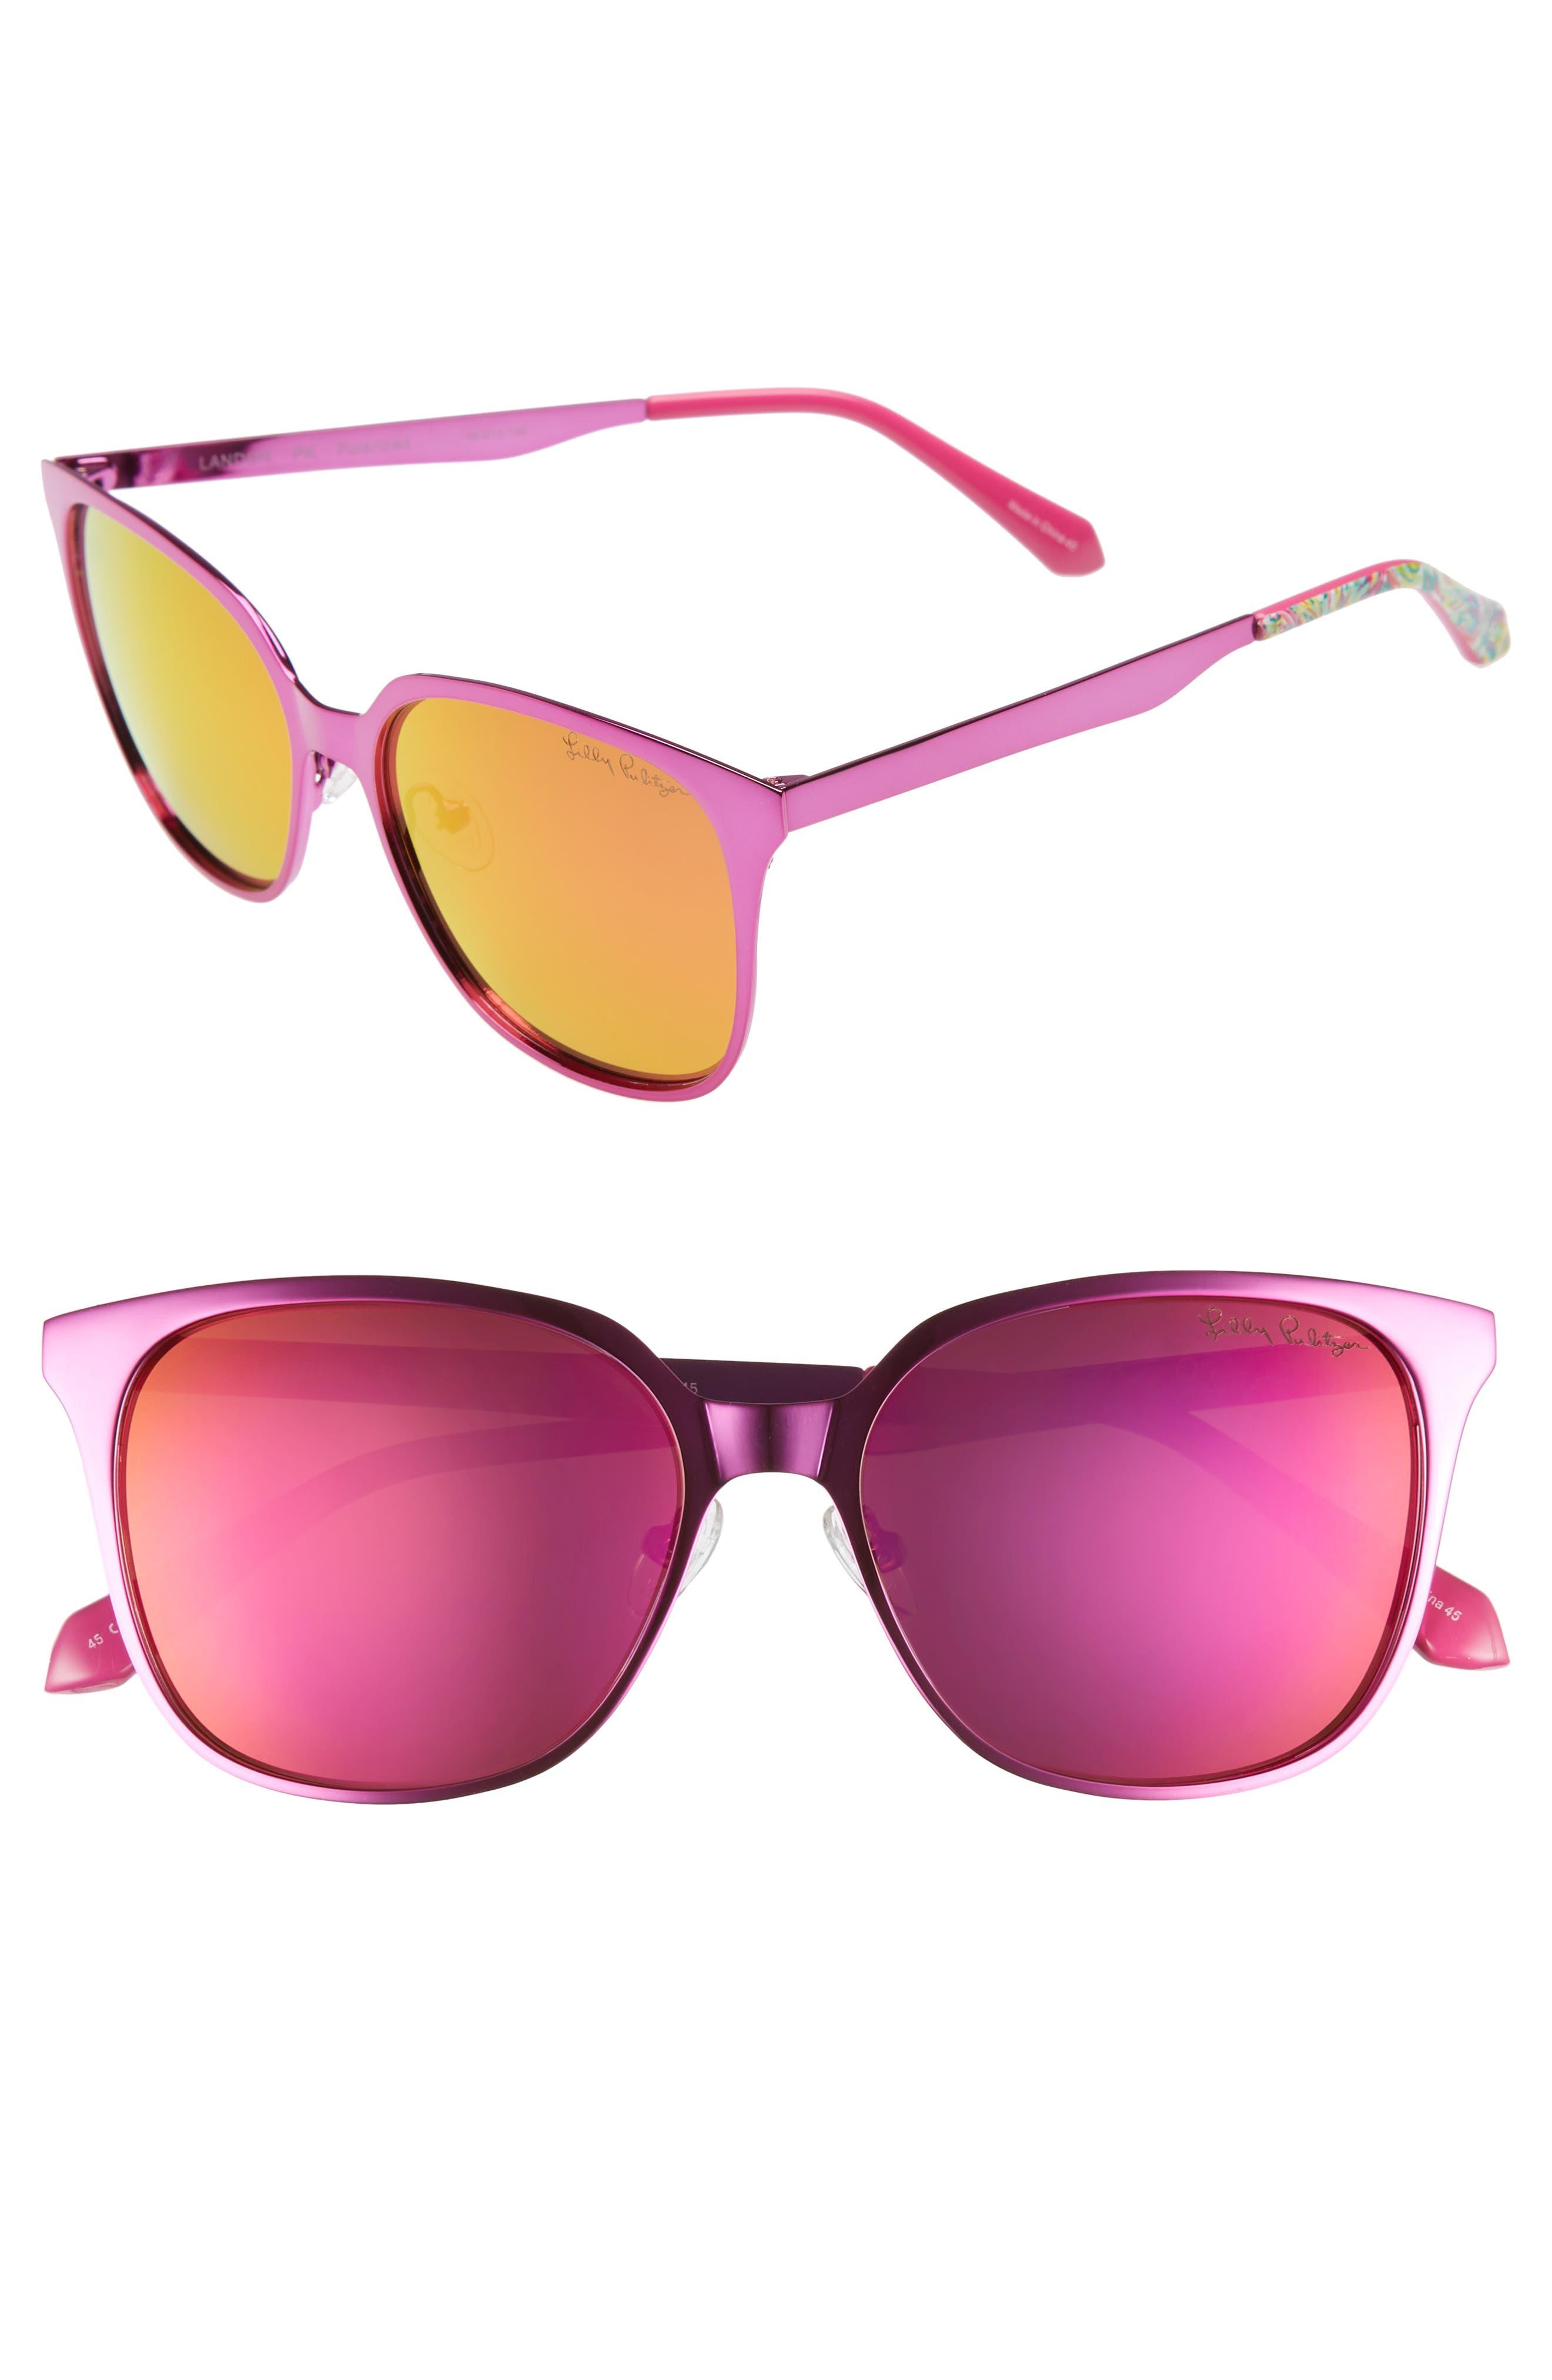 Landon 54mm Polarized Sunglasses,                             Main thumbnail 1, color,                             PINK/ PINK